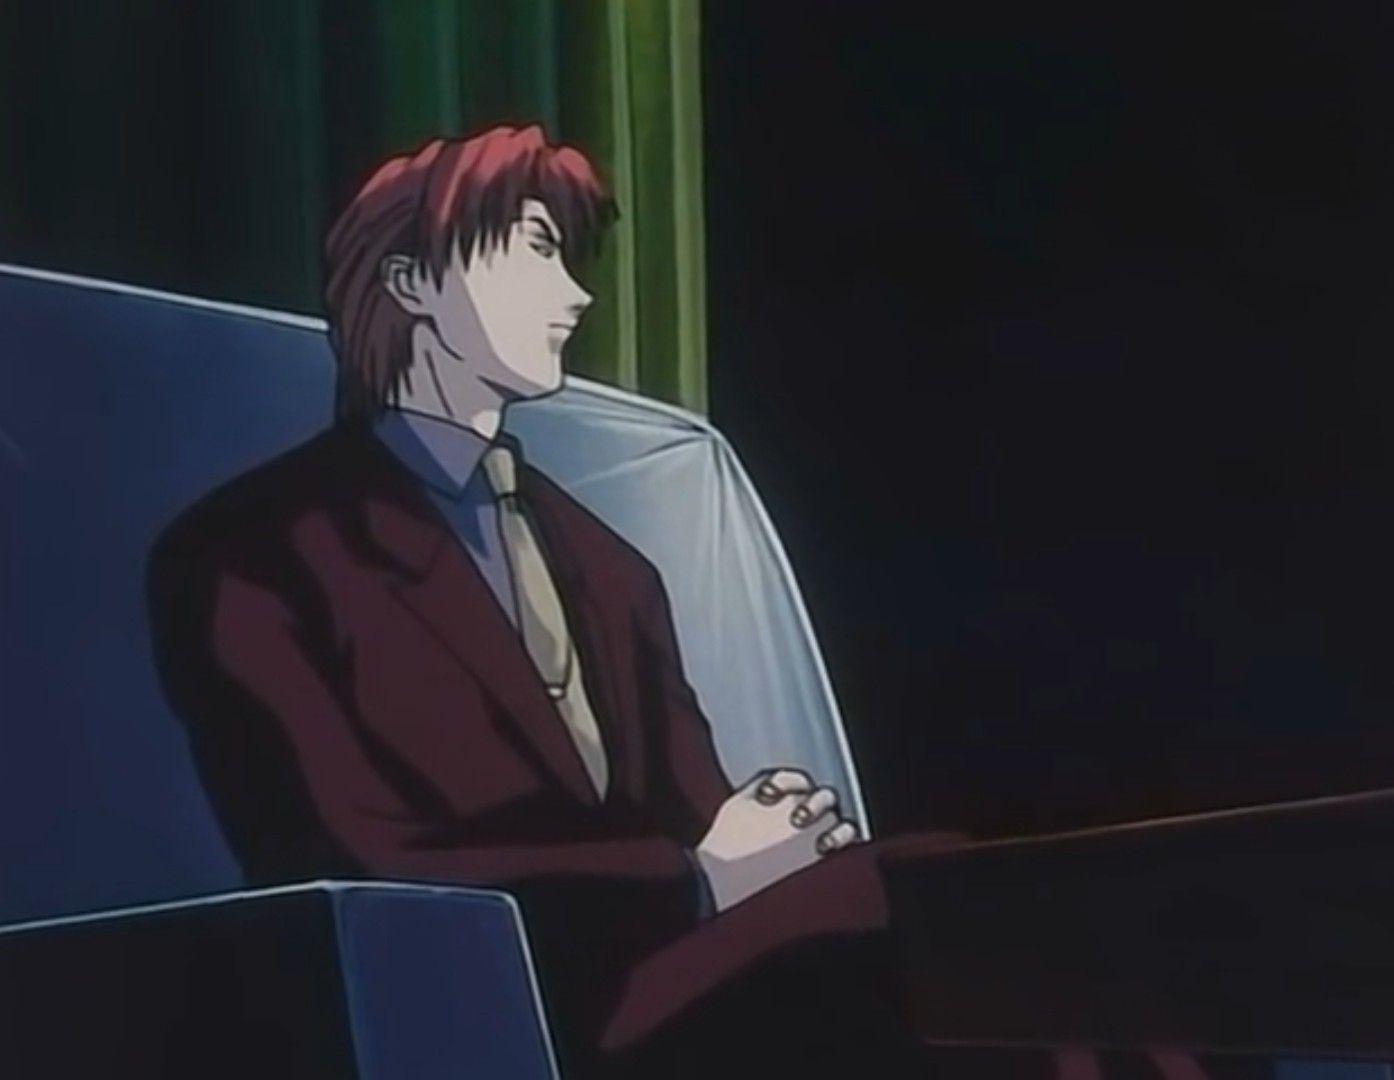 Hisoka Hunter X Hunter 1999 In 2020 Hisoka Haikyuu Tsukishima Hunter X Hunter